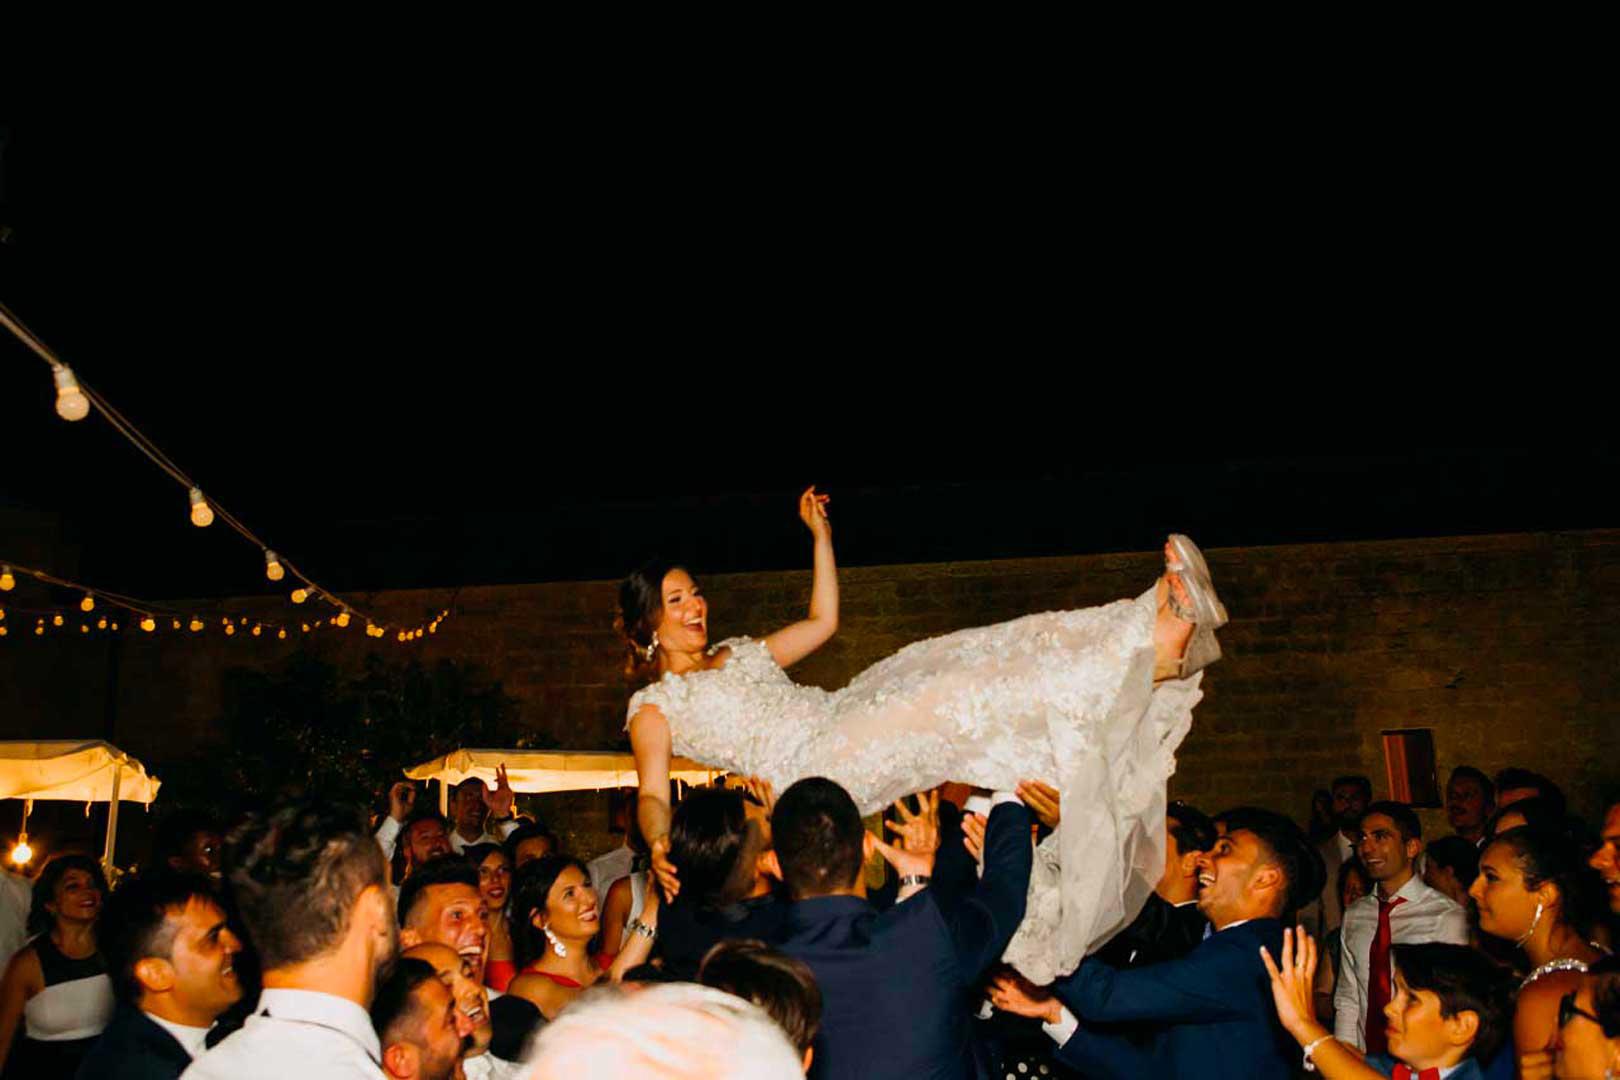 048-festa-matrimonio-gianni-lepore-fotografo